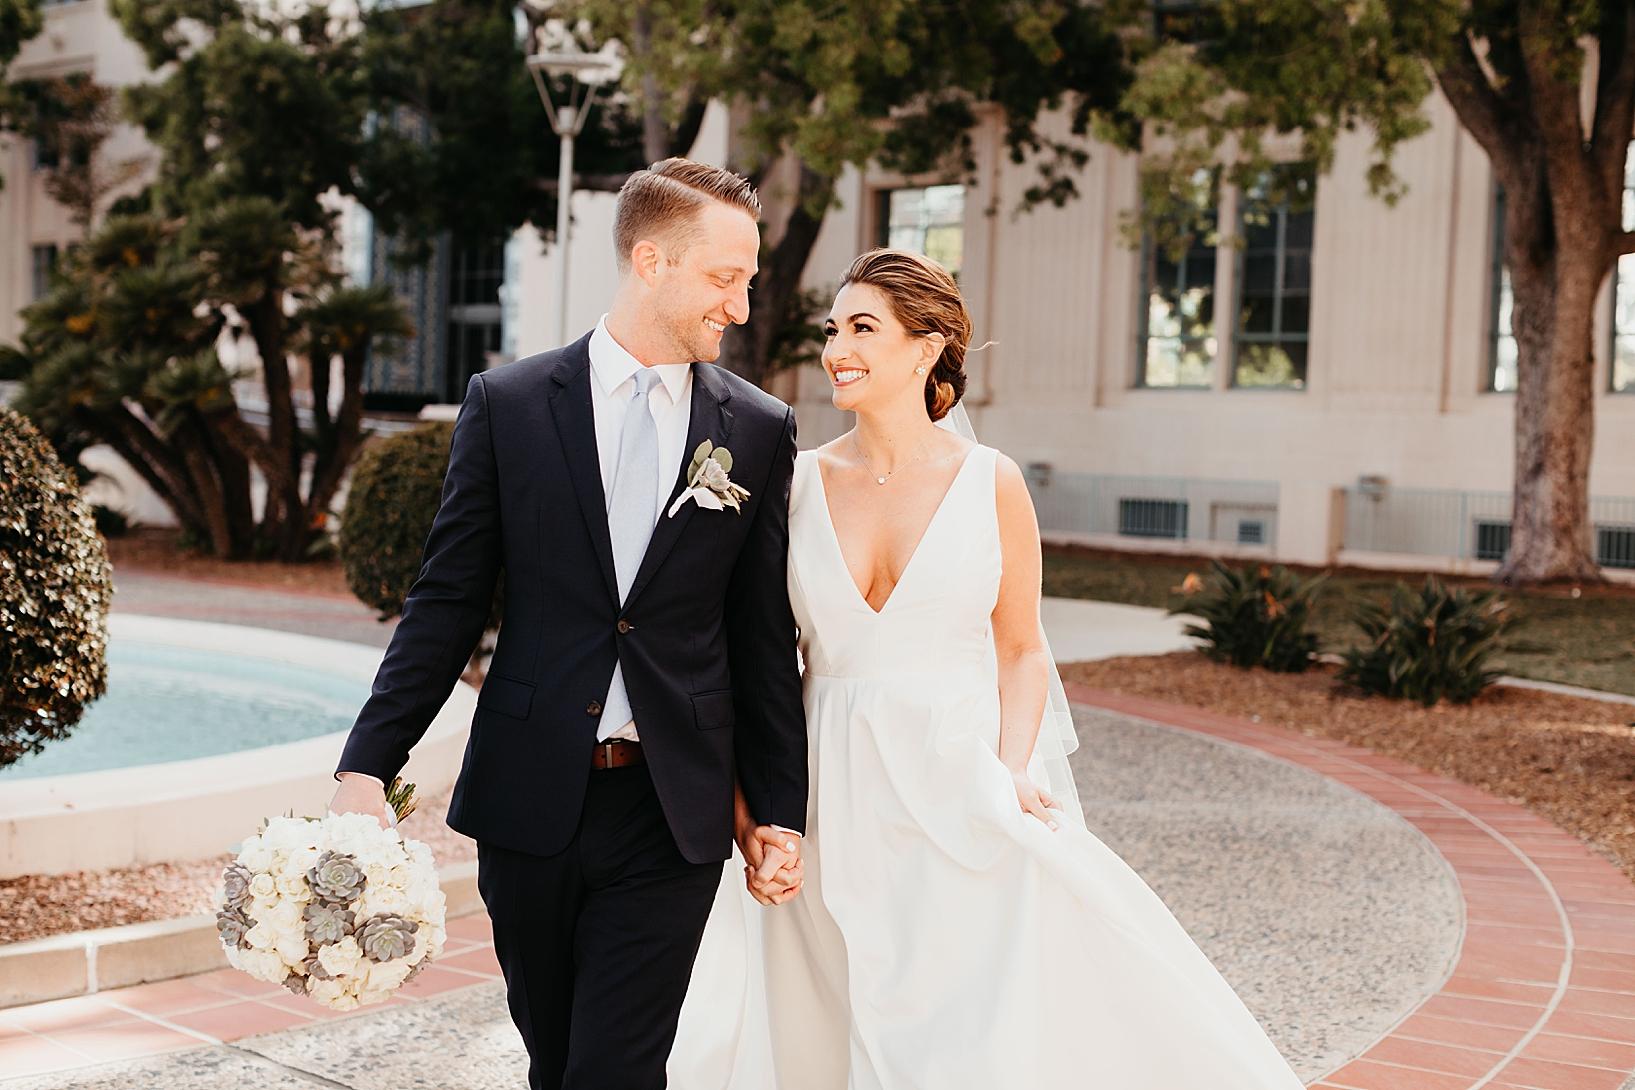 Herb-and-Wood-Wedding-22.jpg